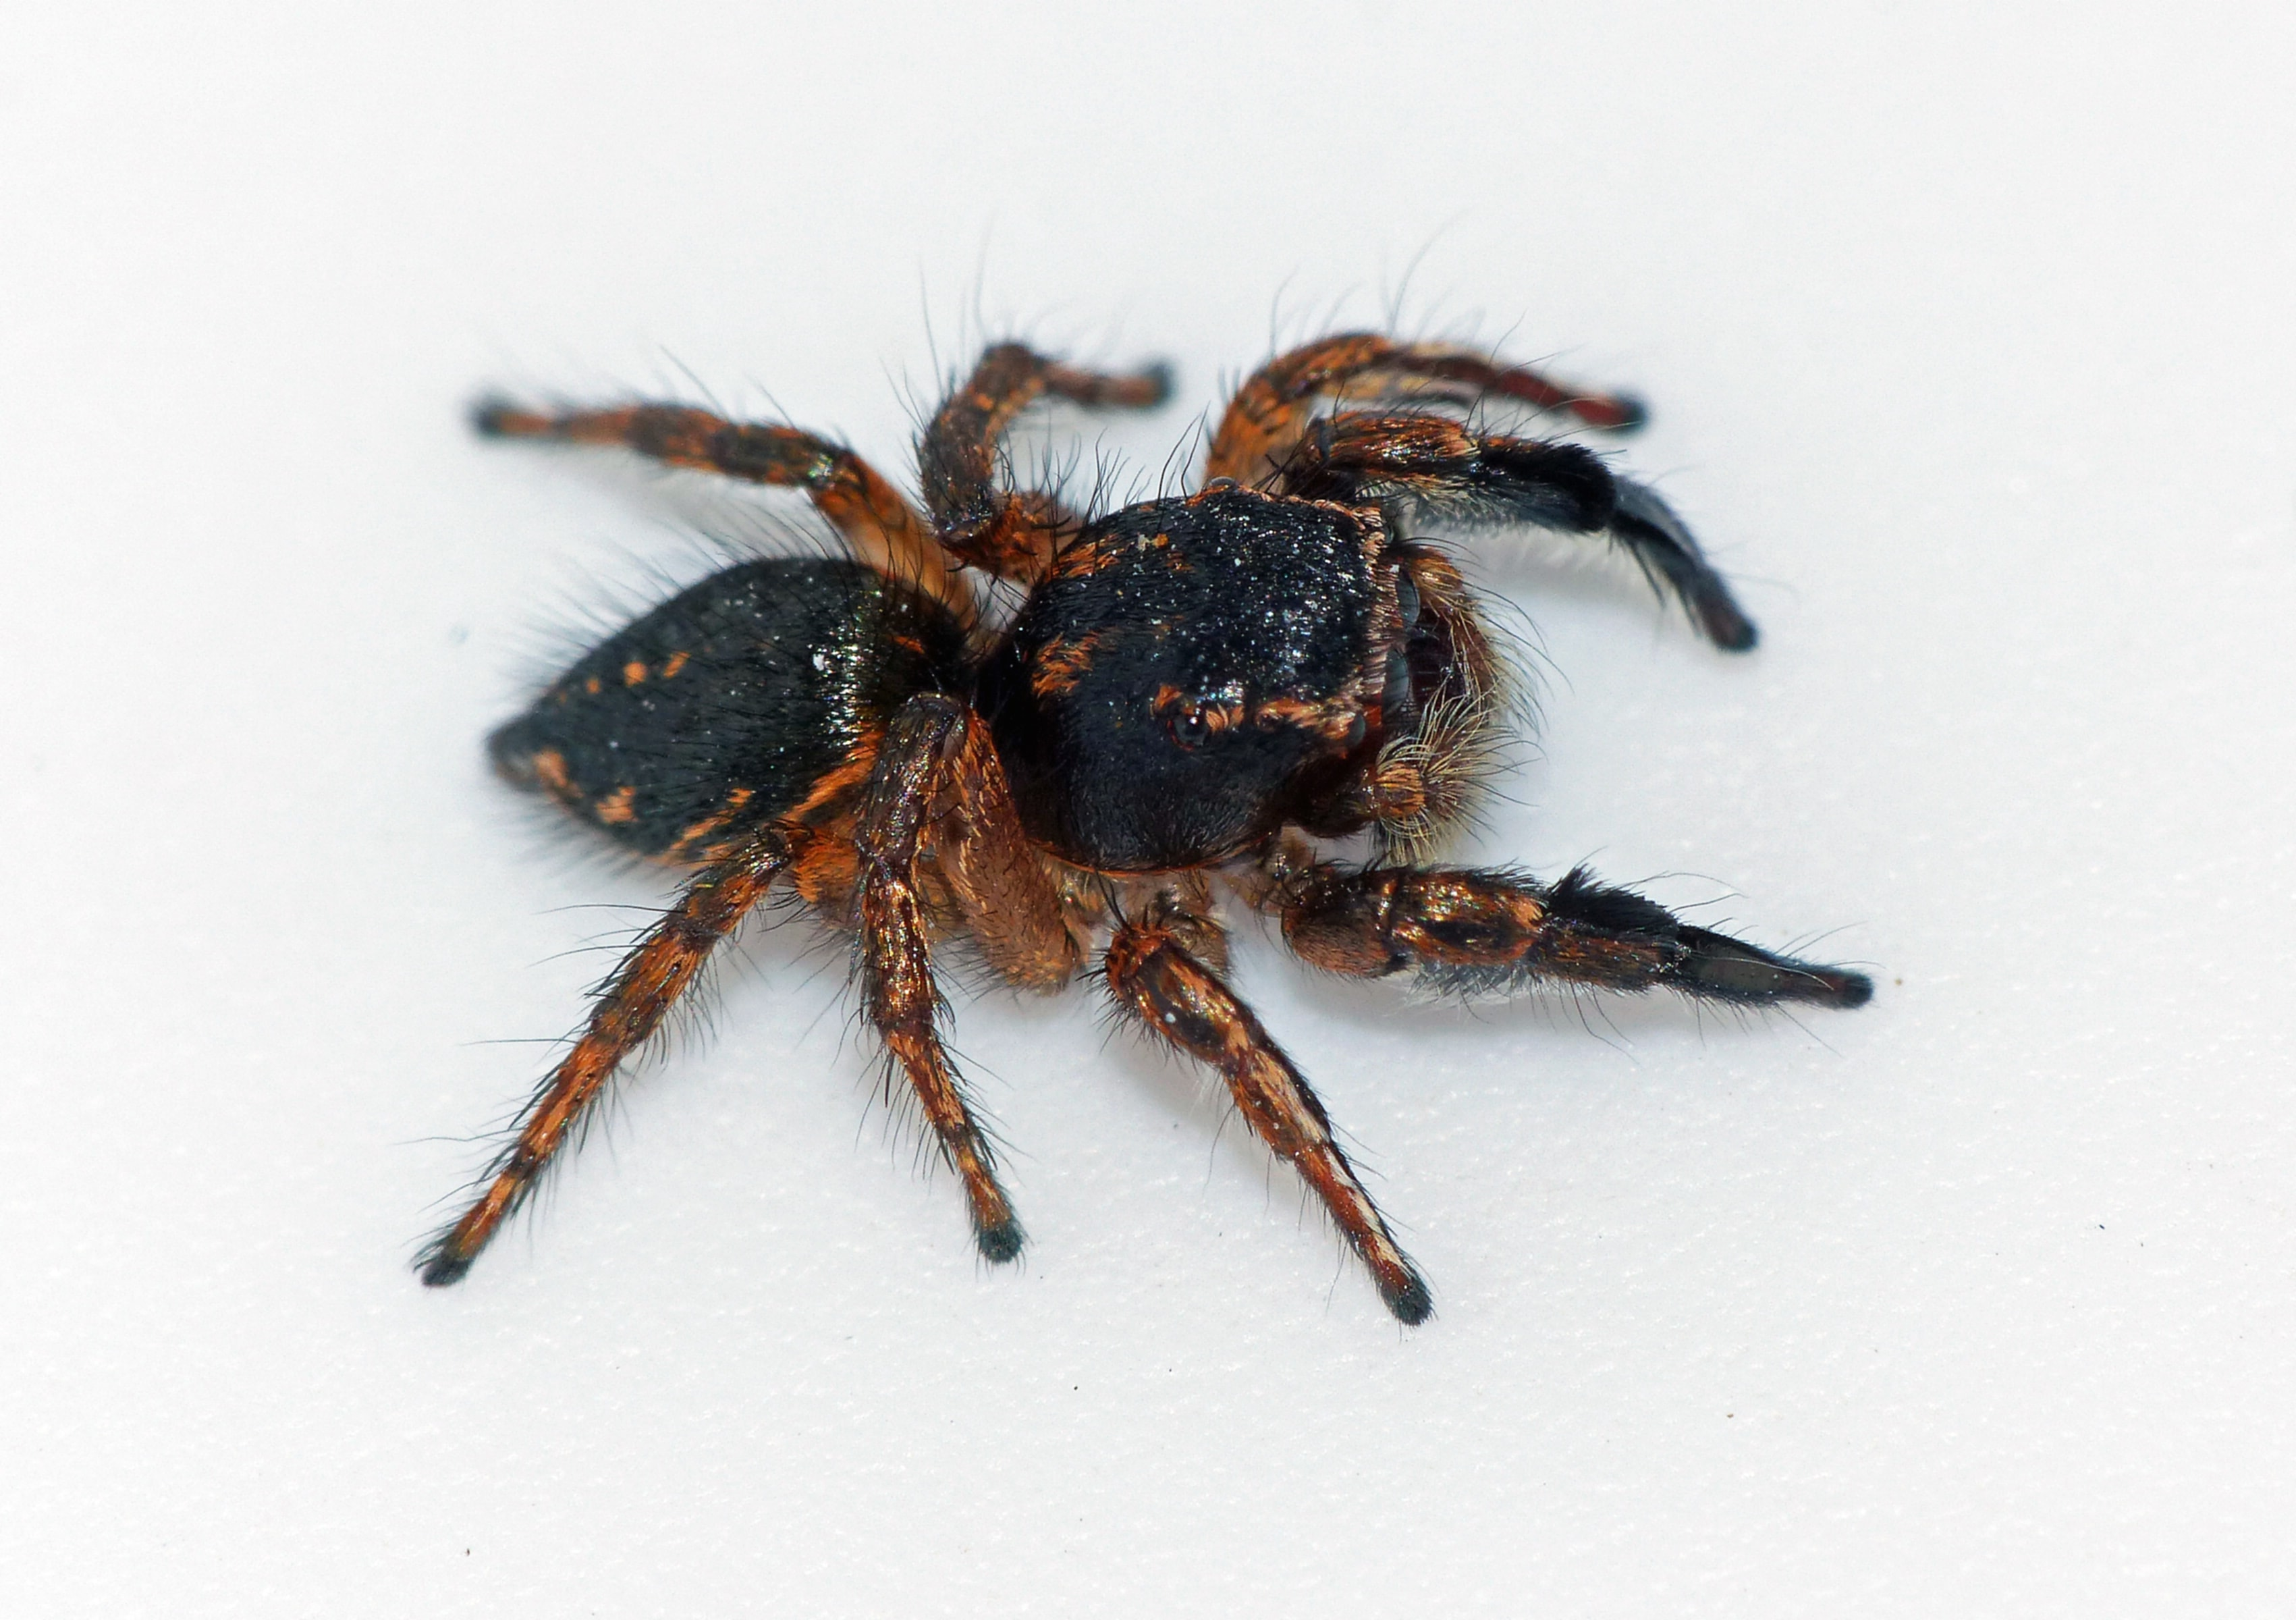 Picture of Habronattus hirsutus - Male - Dorsal